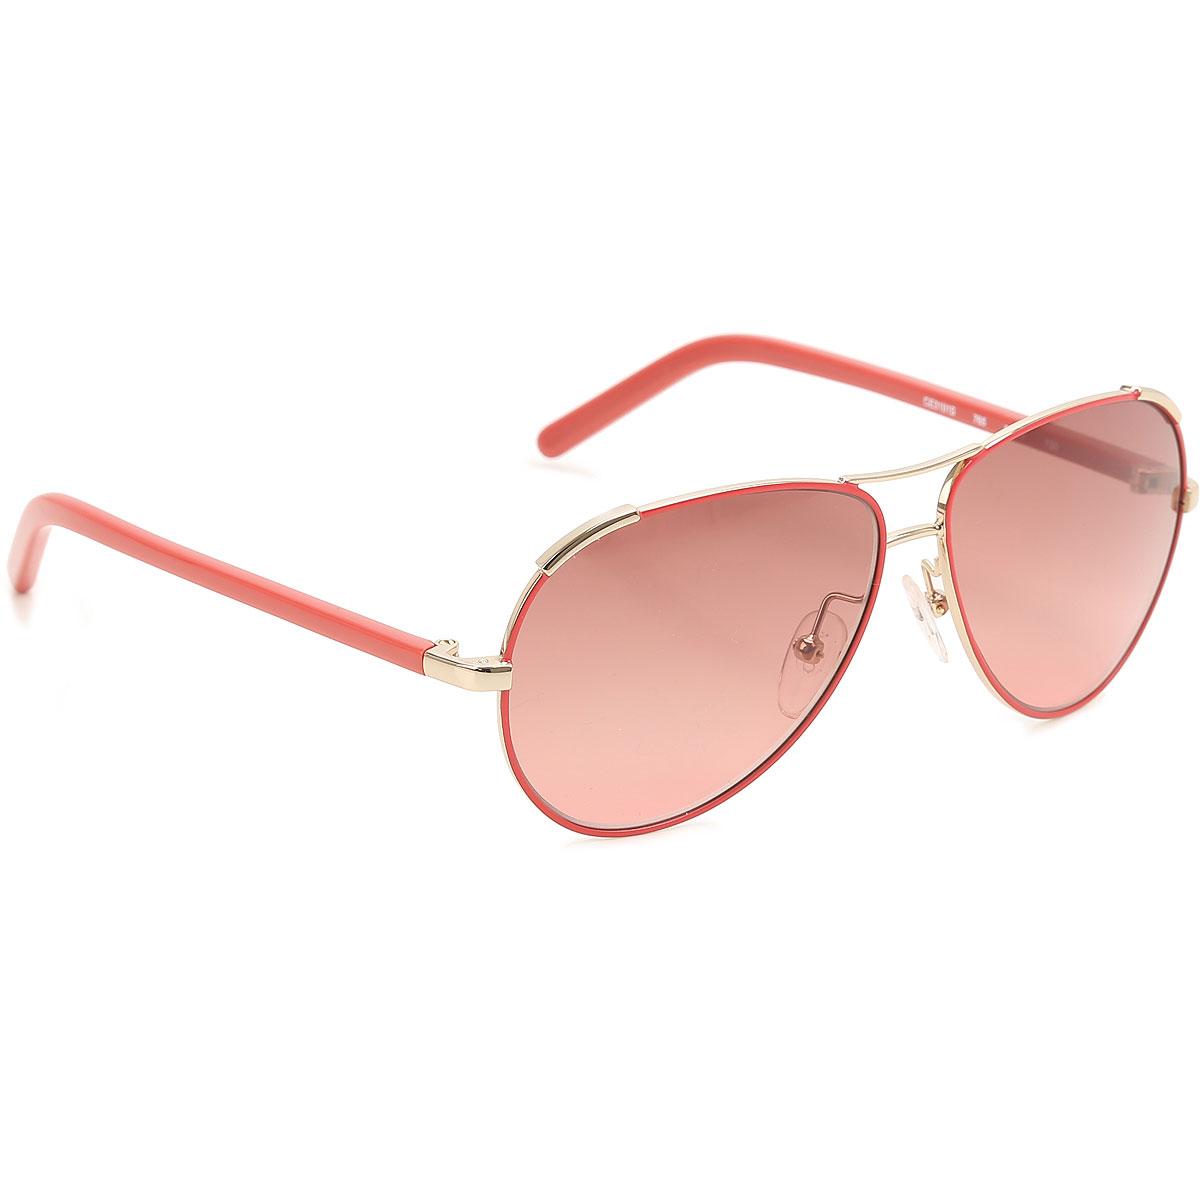 Image of Chloe Kids Sunglasses for Girls On Sale, 2017